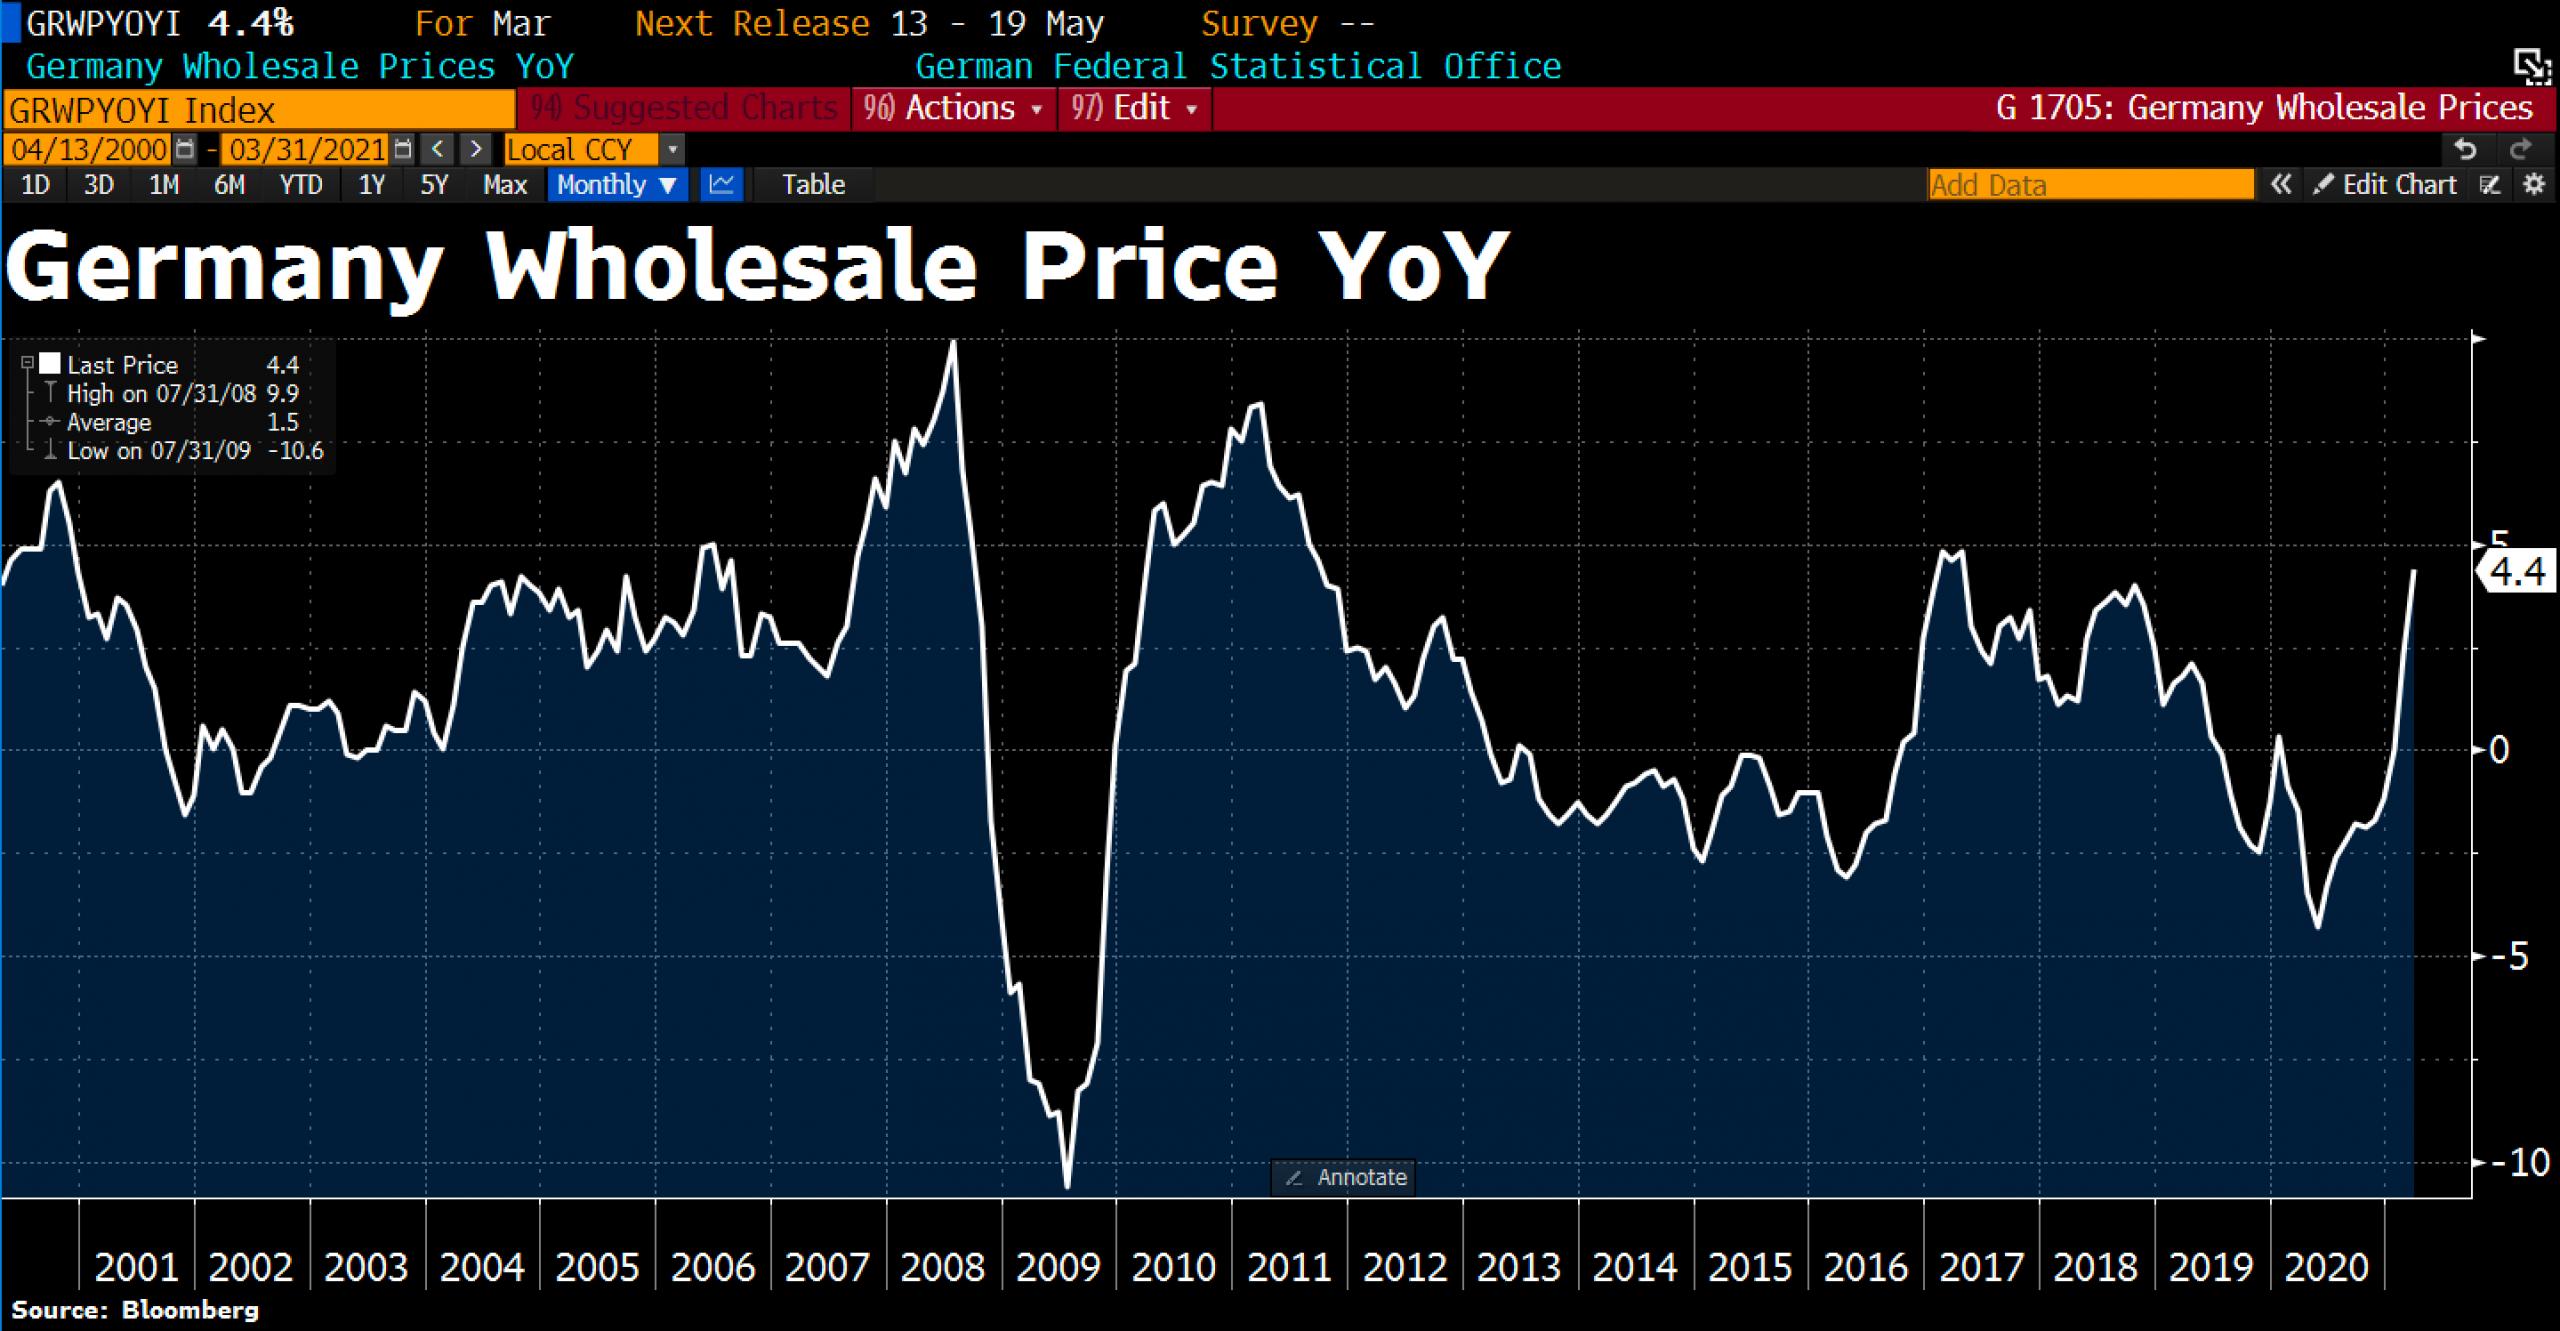 German Whole Sale Prices.© Holger Zschaepitz via Twitter @Schuldensuehner, April 13th, 2021